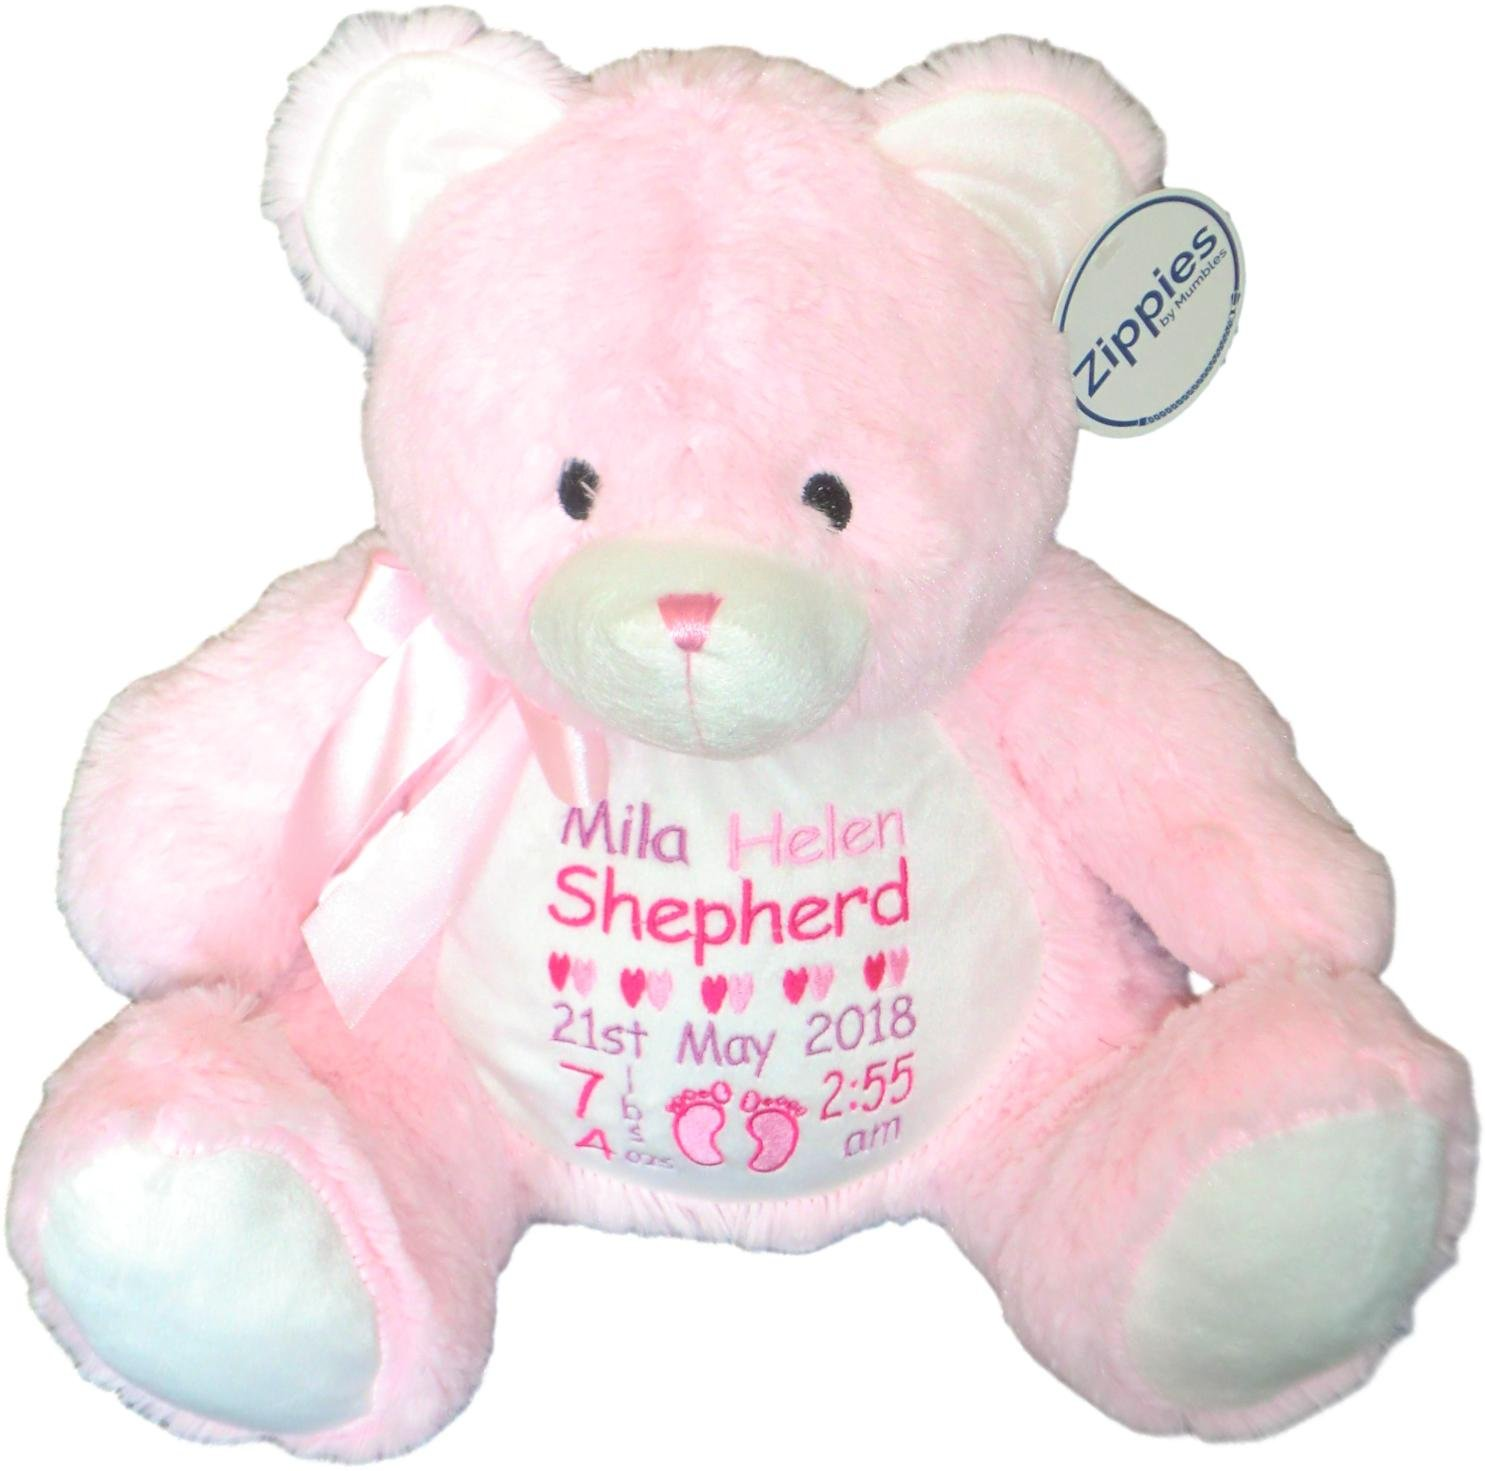 Personalised Teddy Bear New Baby Girl Gift Newborn Baby Shower Pink Teddies